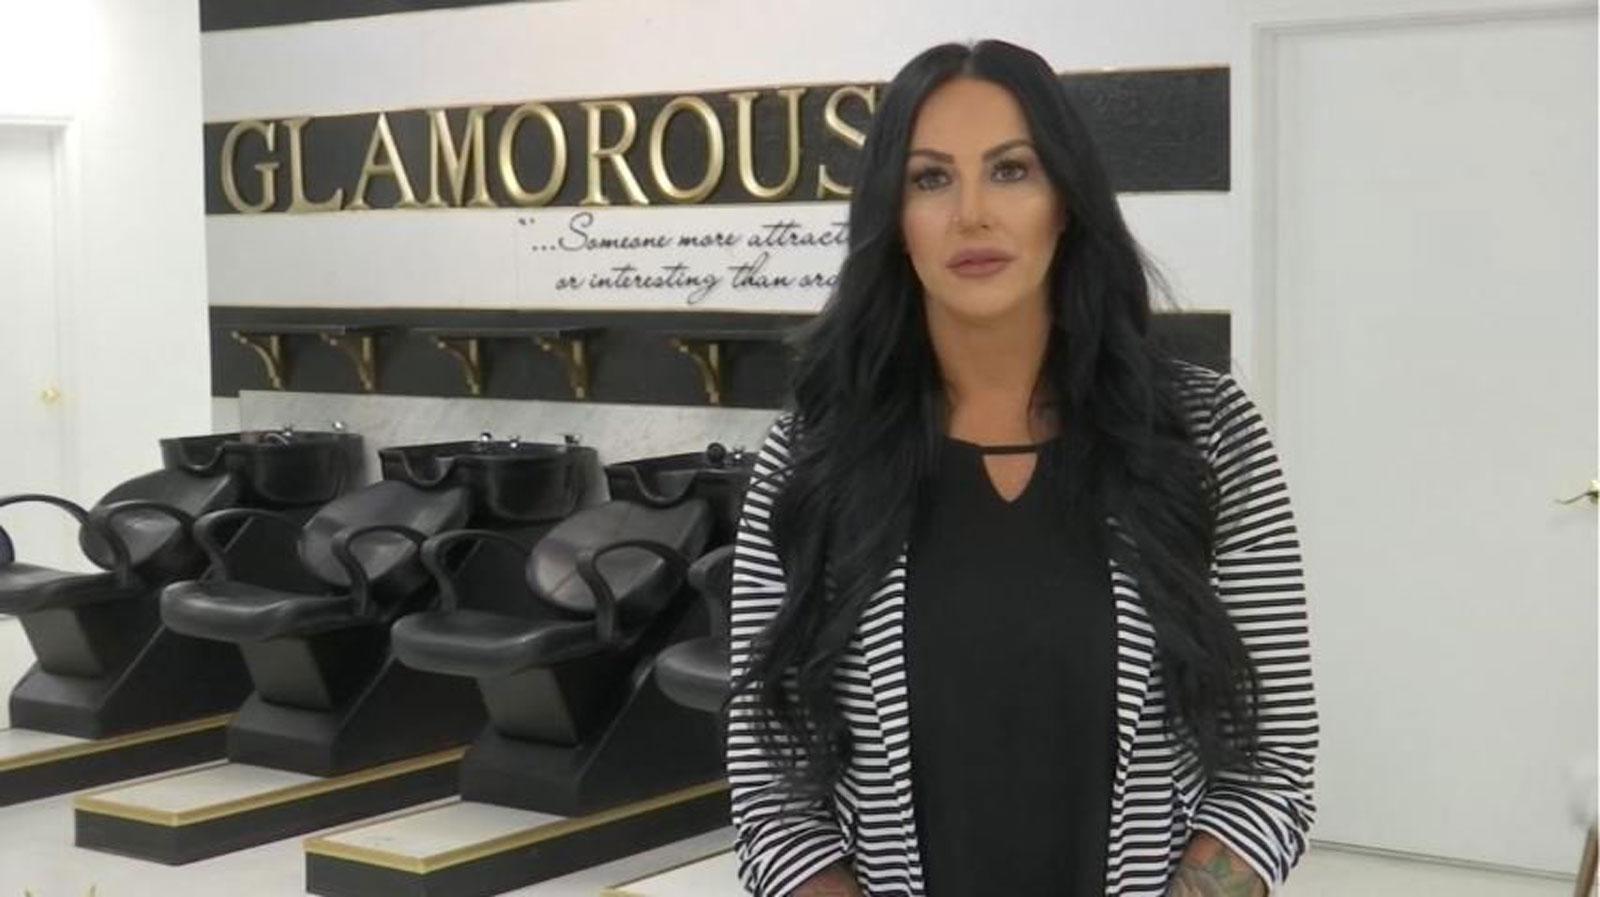 Lindsey Graham is seen inside Glamour Salon, the business she owns in Salem, Oregon. (KPTV via CNN)